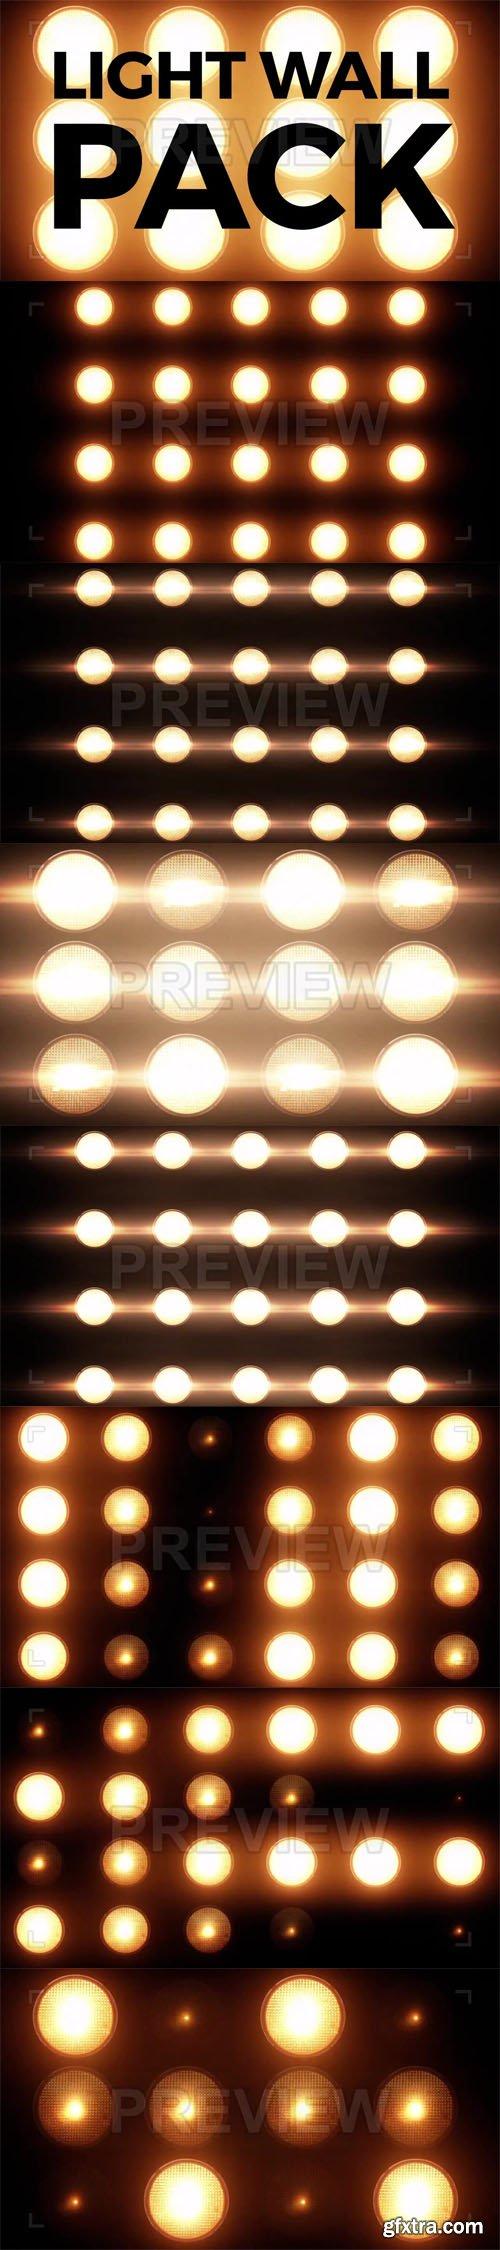 MA - Light Wall Pack